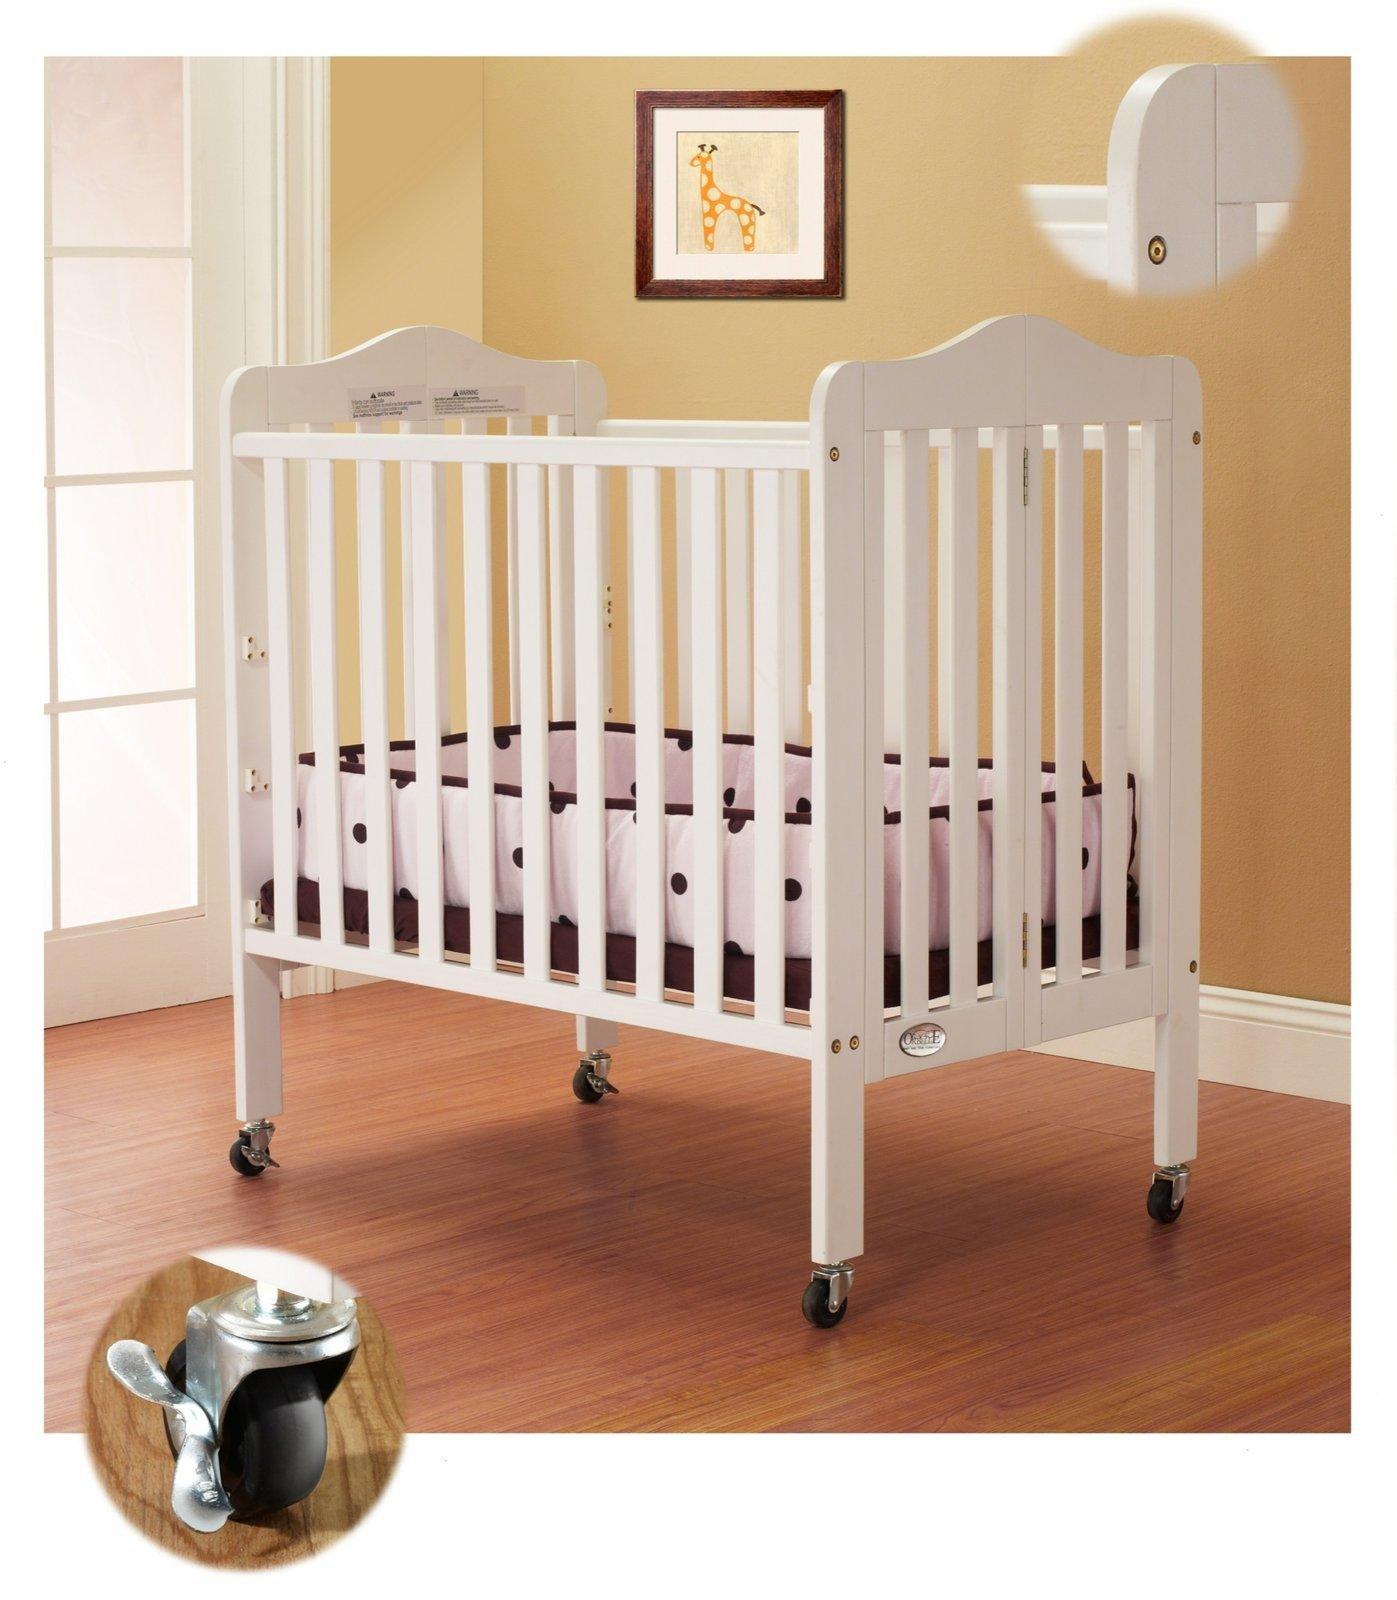 Orbelle Noa Three Level Portable Crib, White by Orbelle